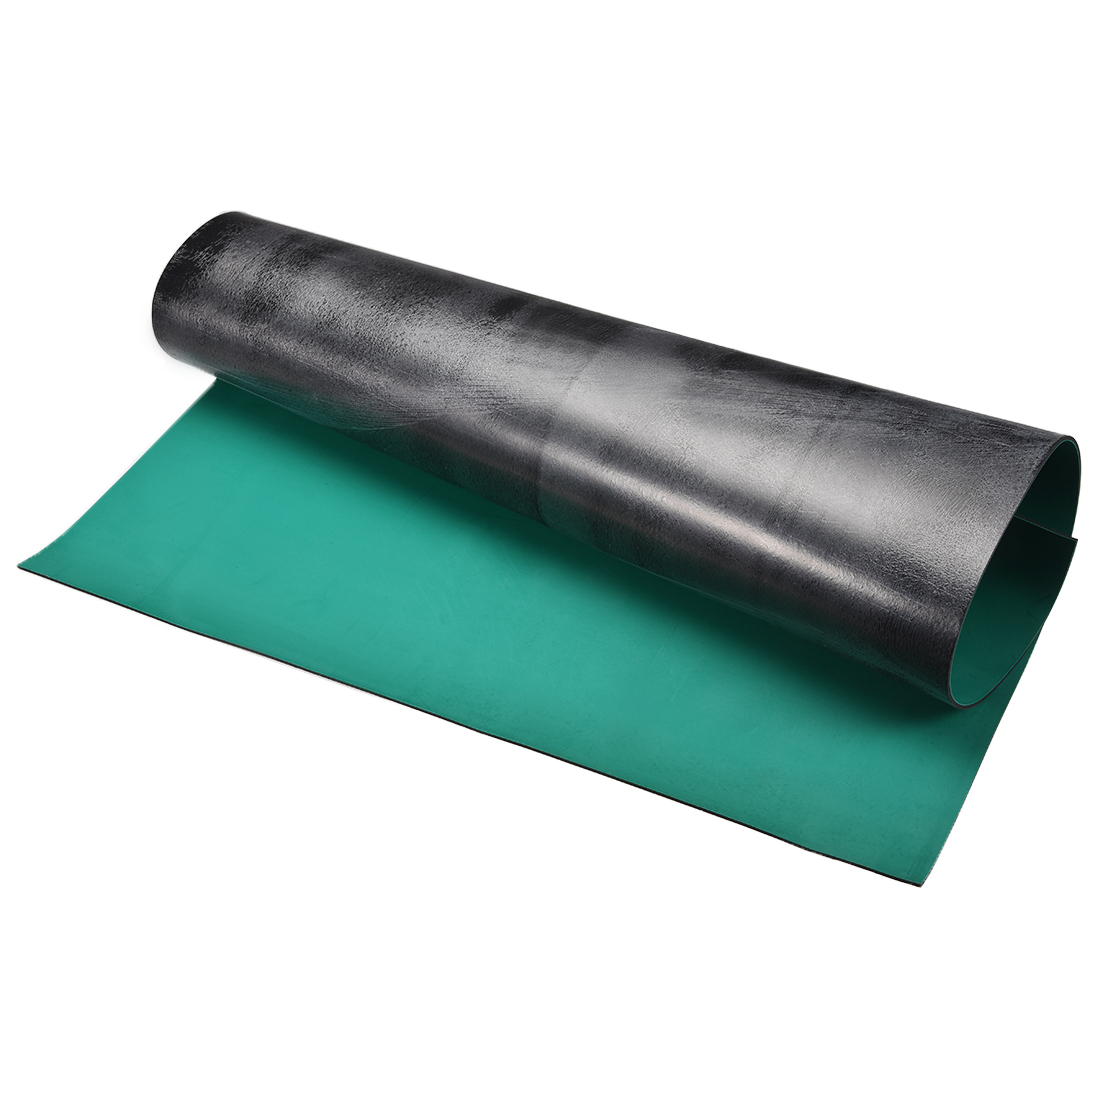 Anti Static ESD Mat High Temperature Rubber Table Mat 610 x 510mm Green Black